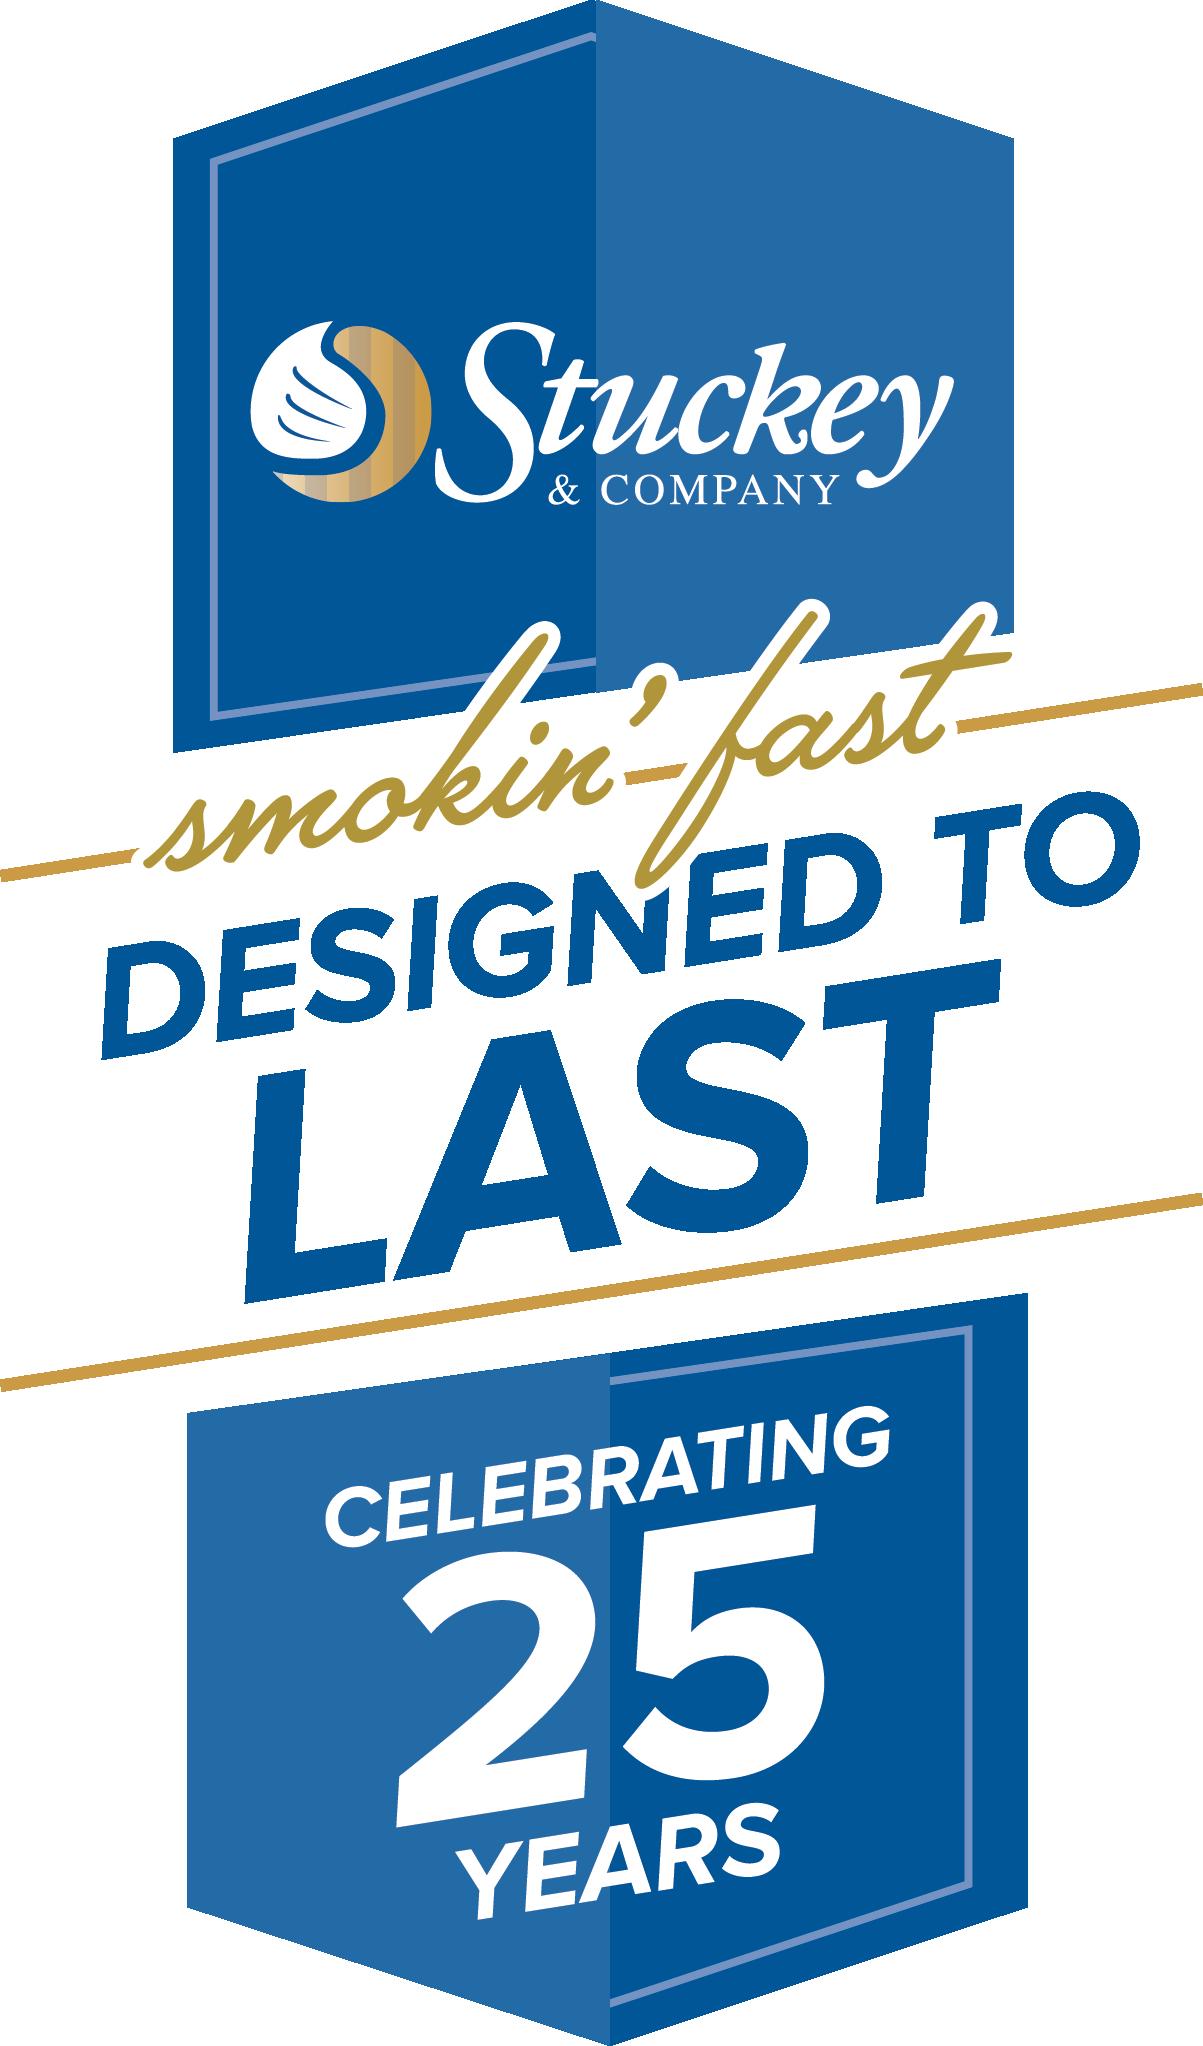 Stuckey & Company Smokin' Fast designed to last